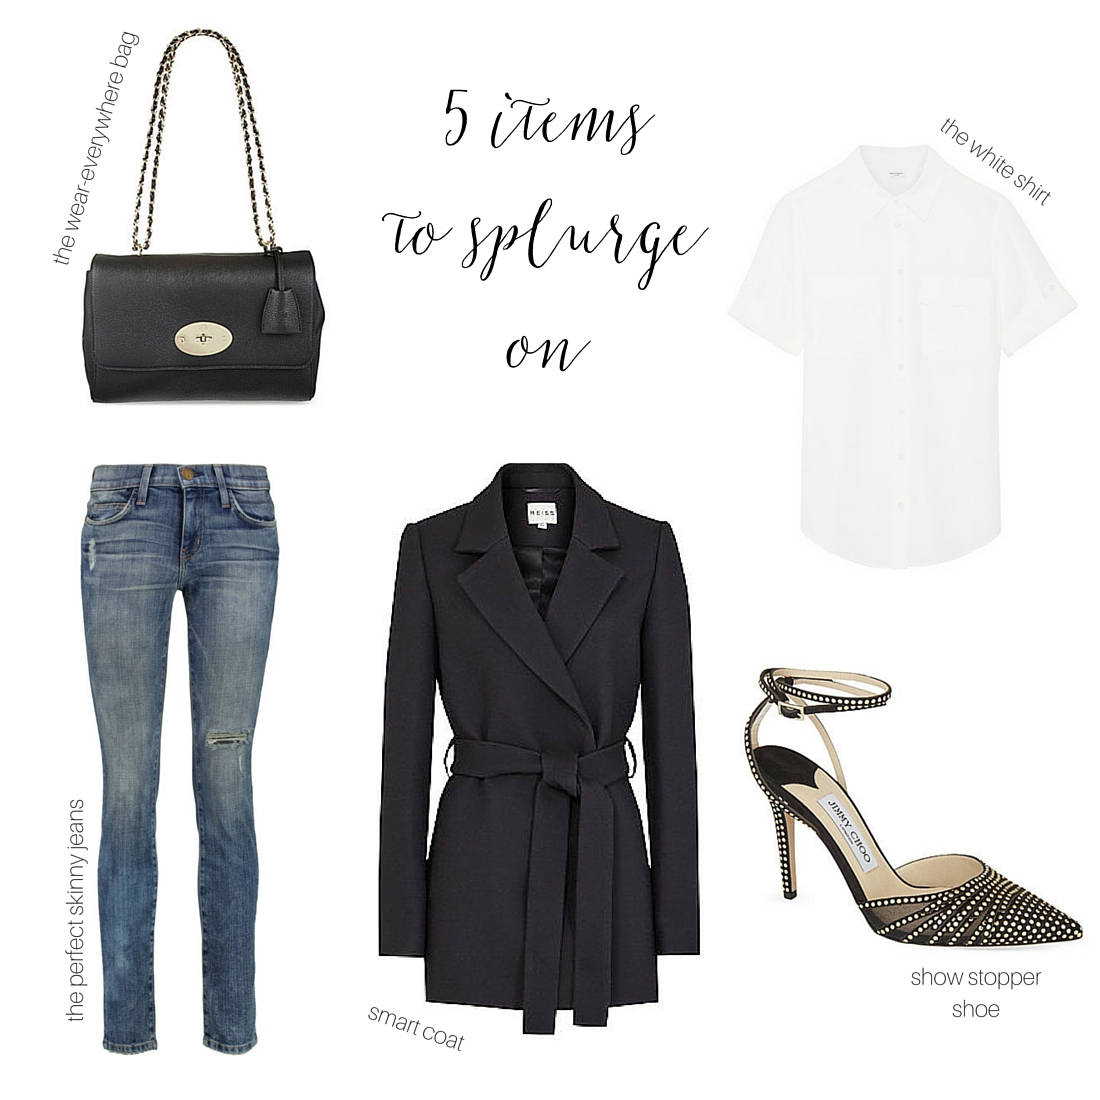 5 style items to splurge on